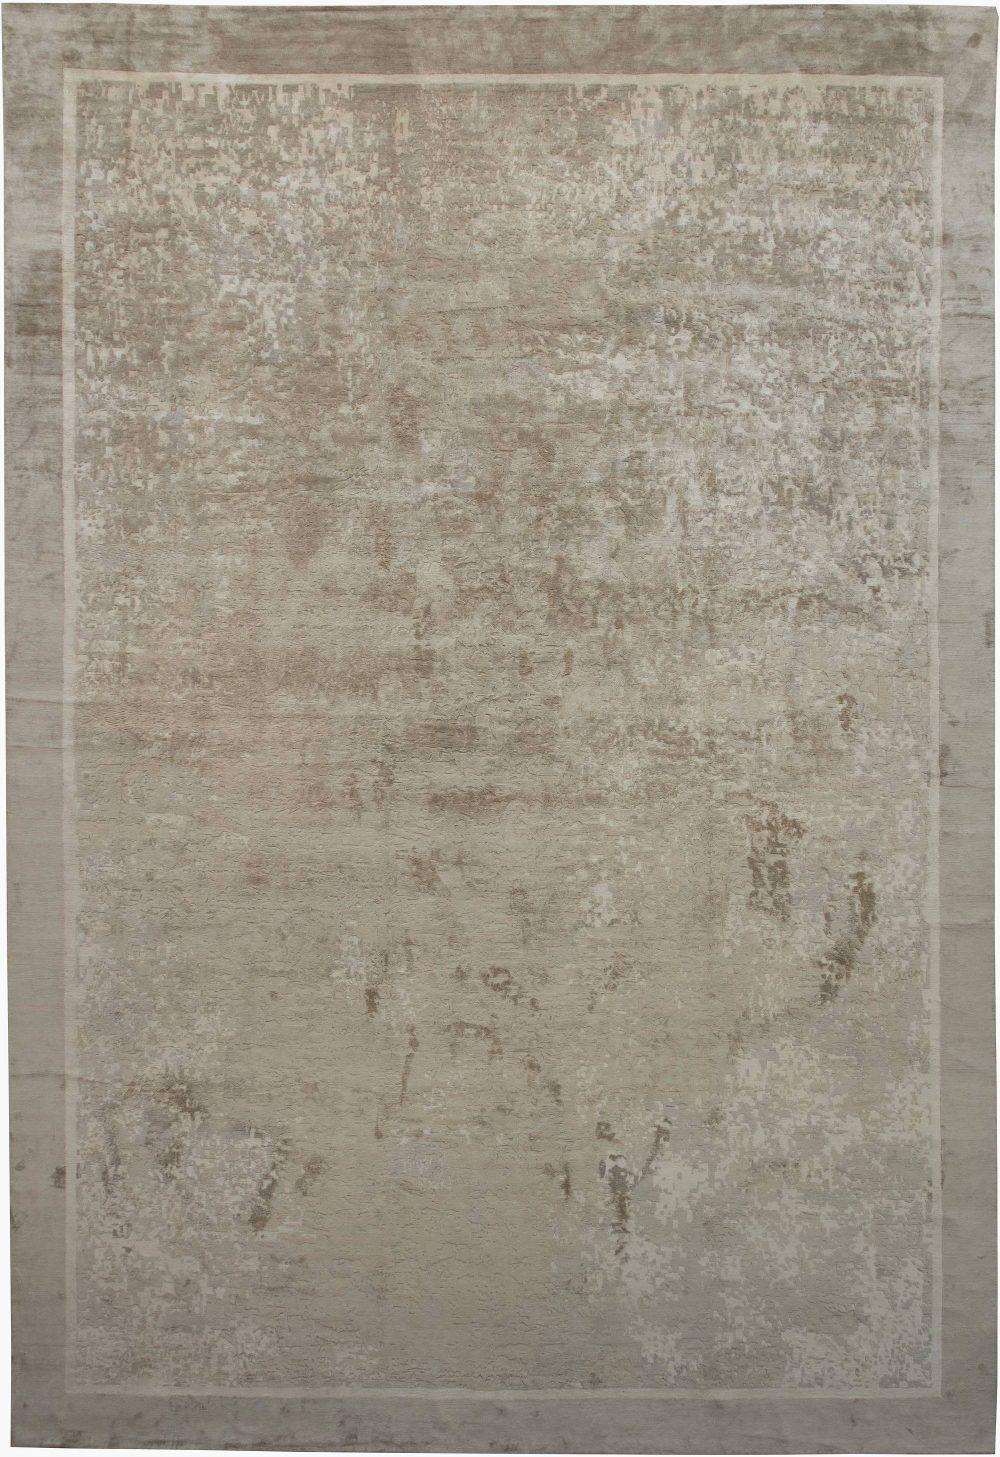 Textured Rug in Natural Tones N11605